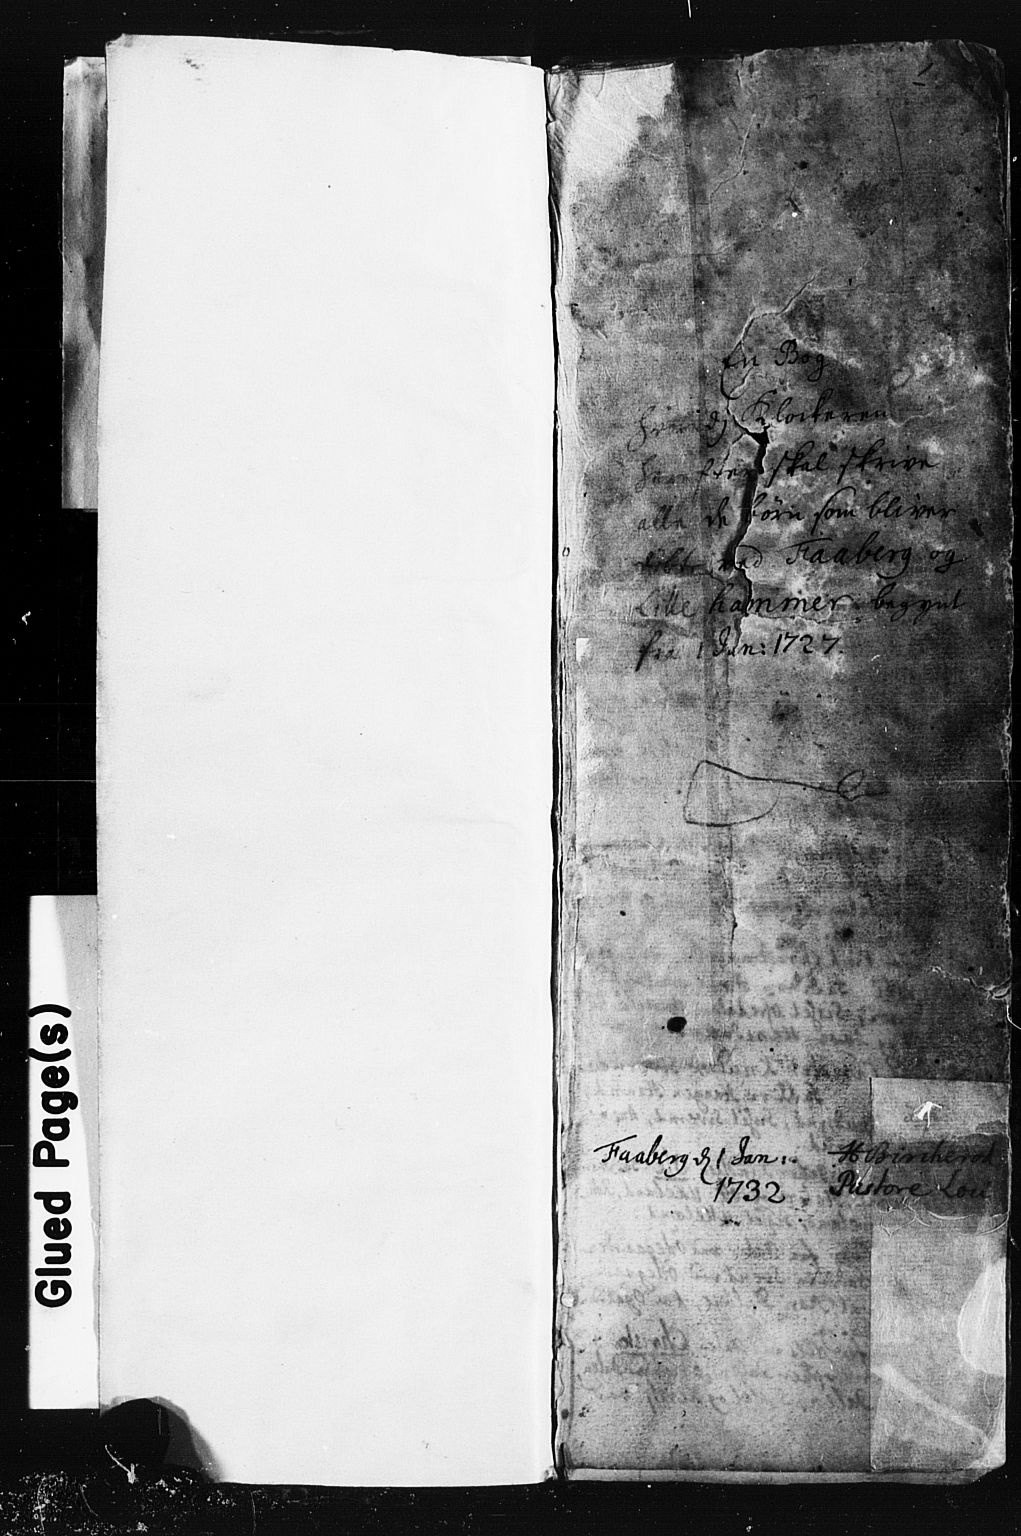 SAH, Fåberg prestekontor, Klokkerbok nr. 1, 1727-1767, s. 0-1